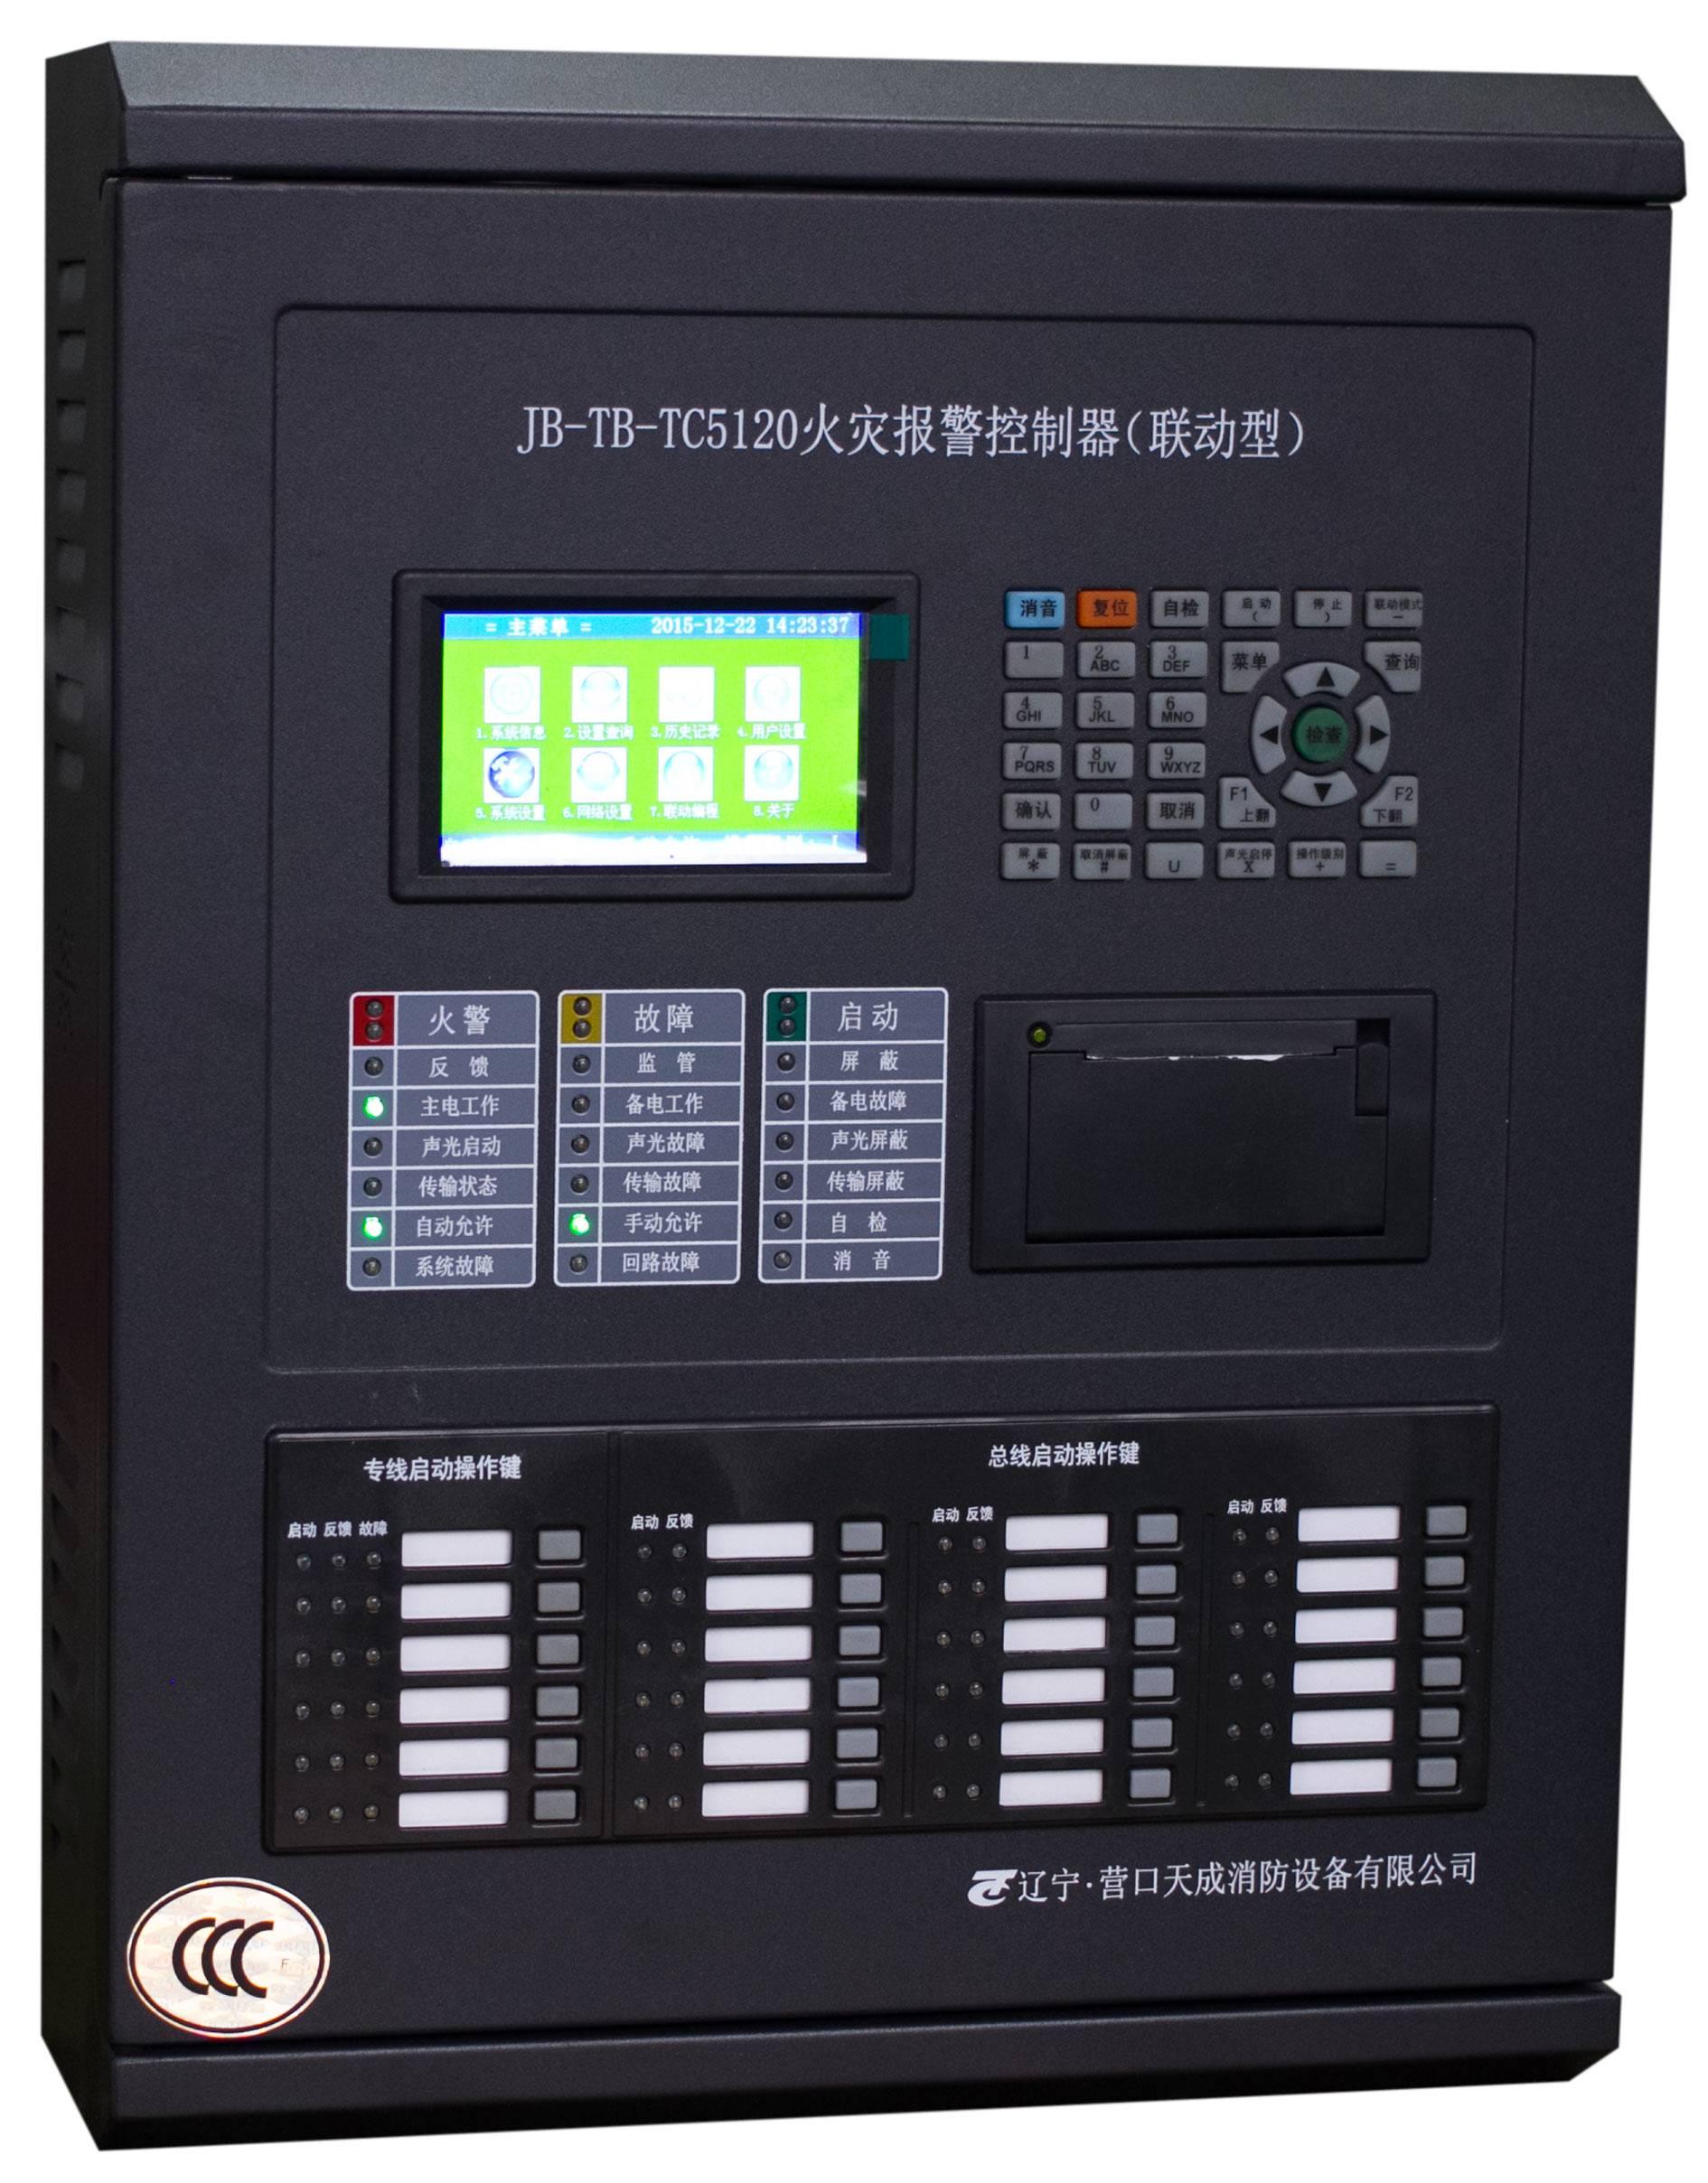 JB-TB-TC5120 Fire Alarm Control Panel (Linkage type)